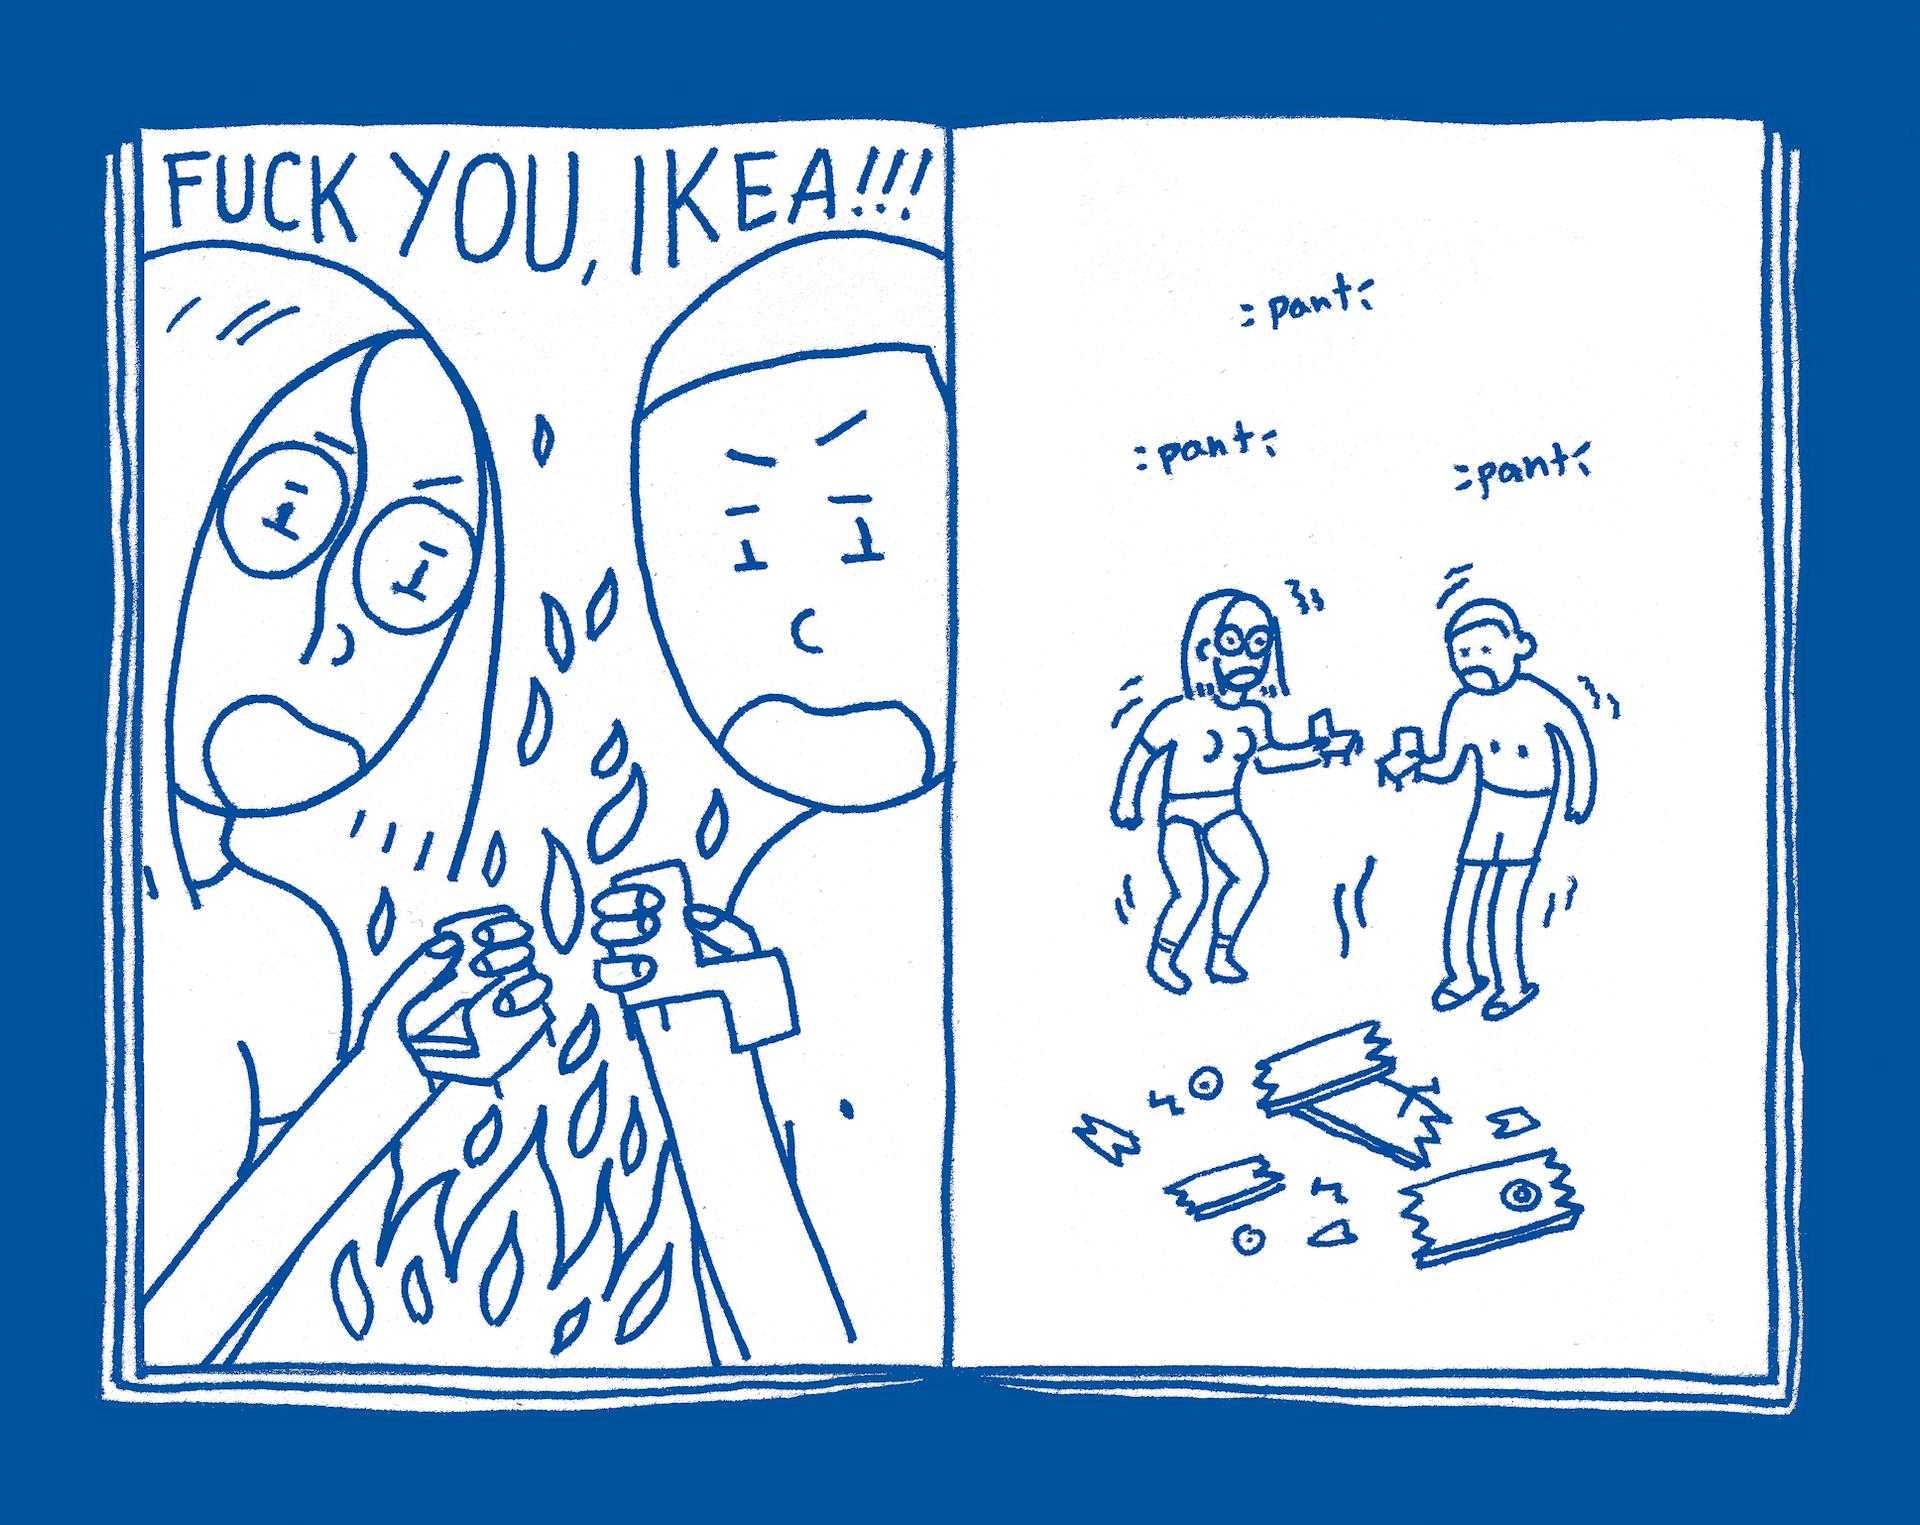 IKEA_drawnpages_600dpi_15-16.png